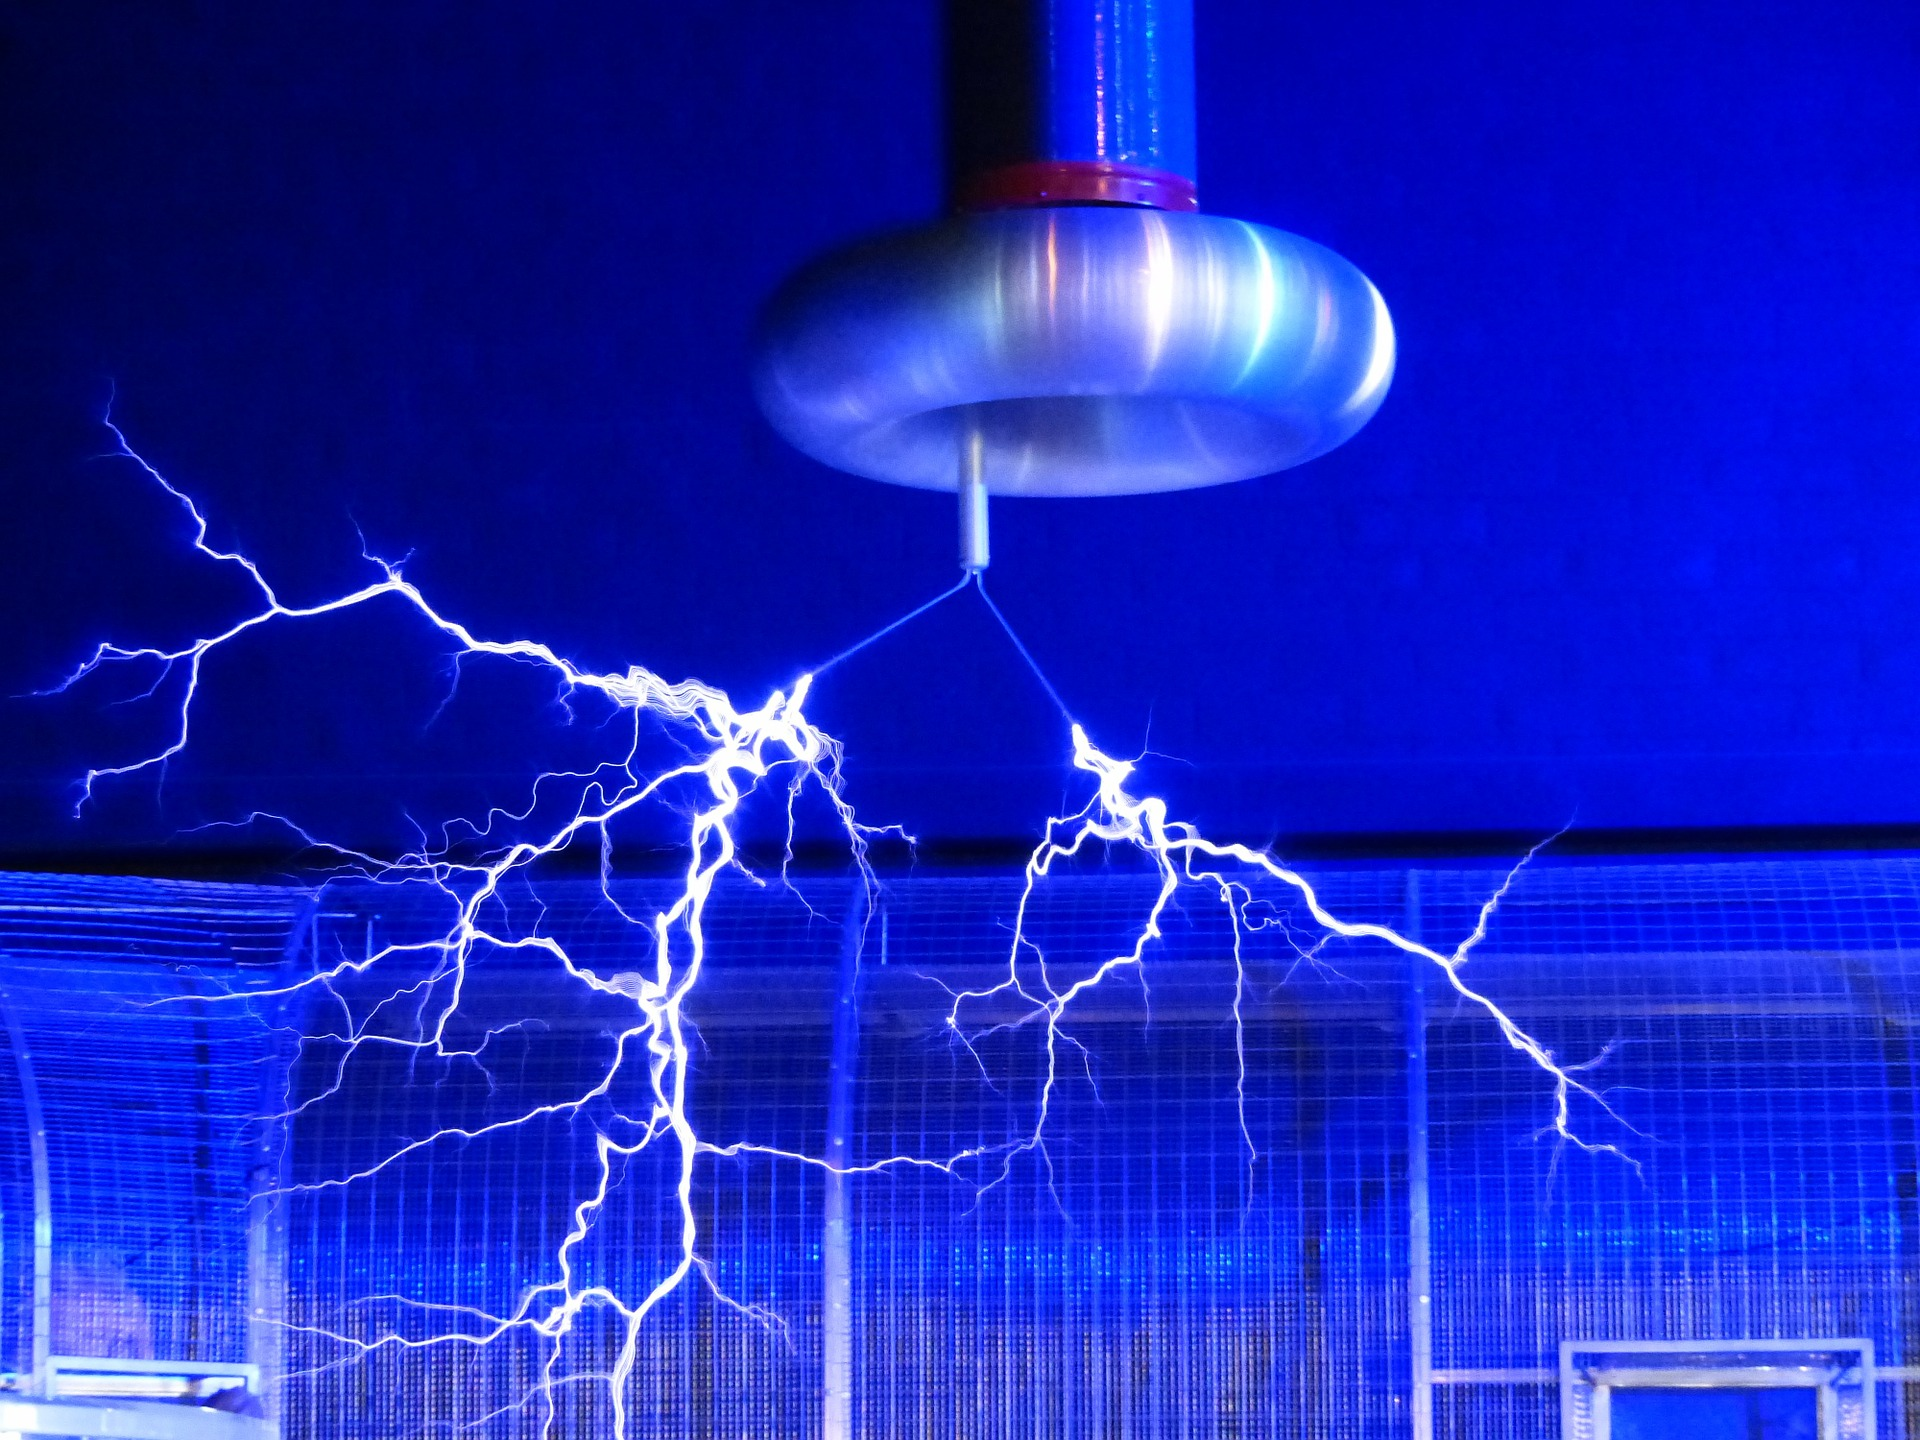 Electrification & NZE Industry